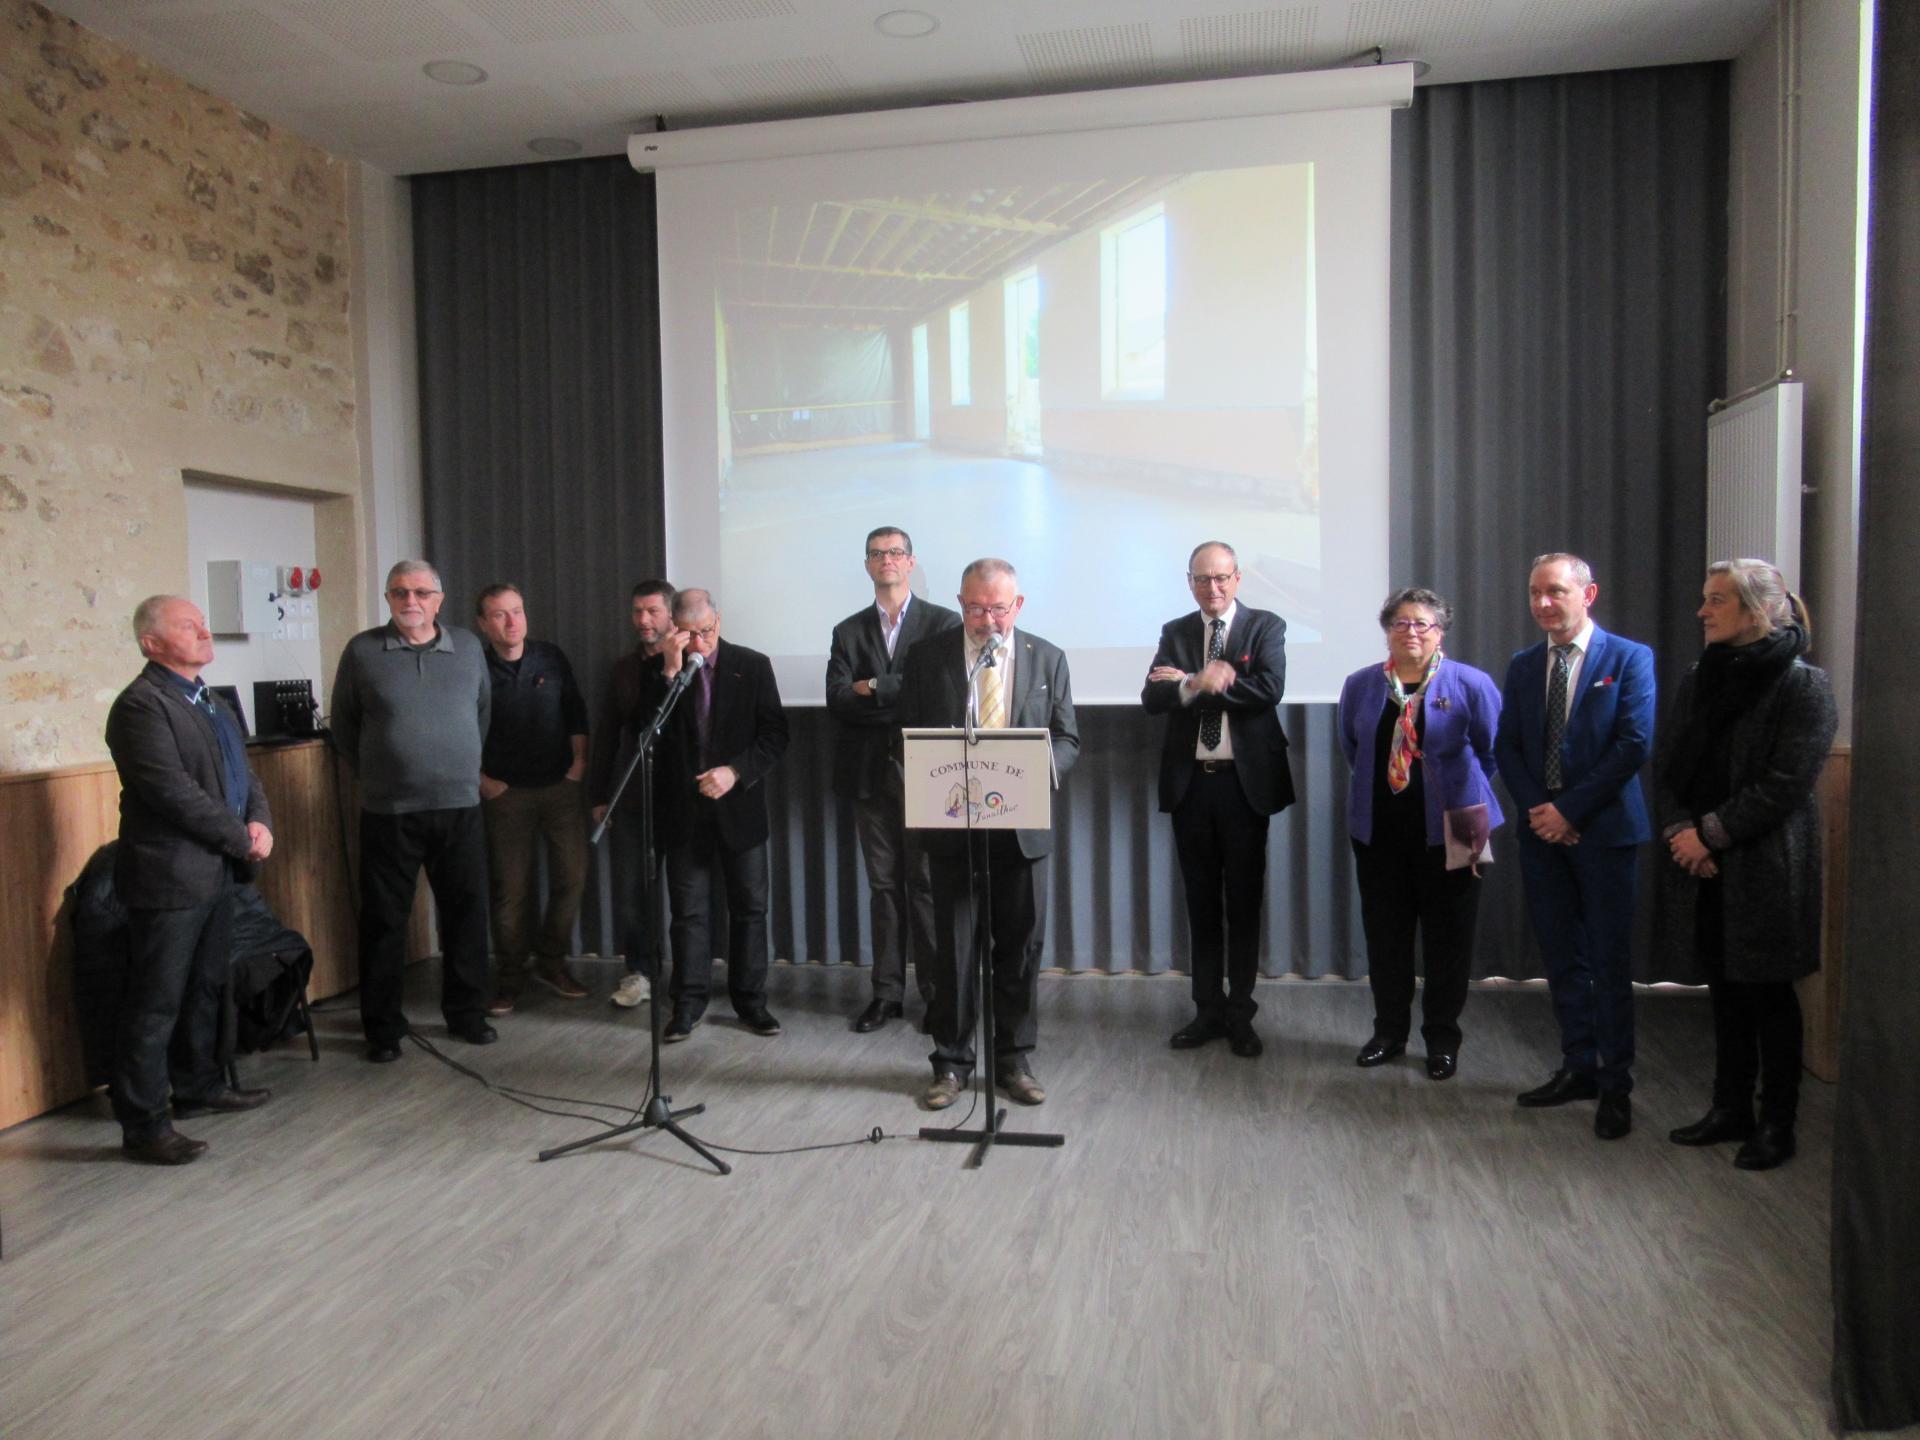 Inauguration Salle des Fêtes - mars 2019